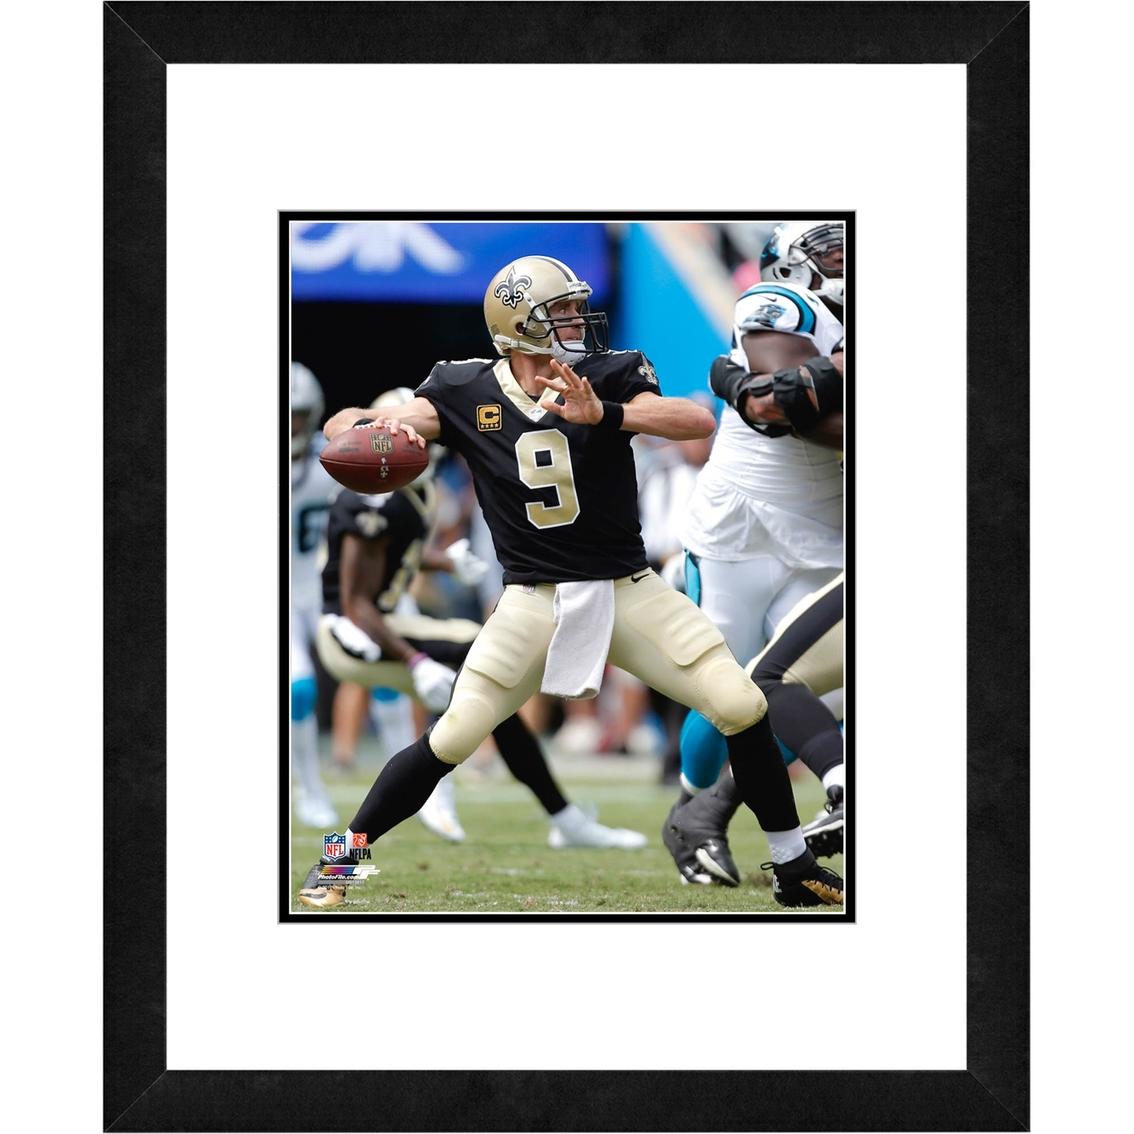 Nfl New Orleans Saints Drew Brees Framed Photo Nfl Fan